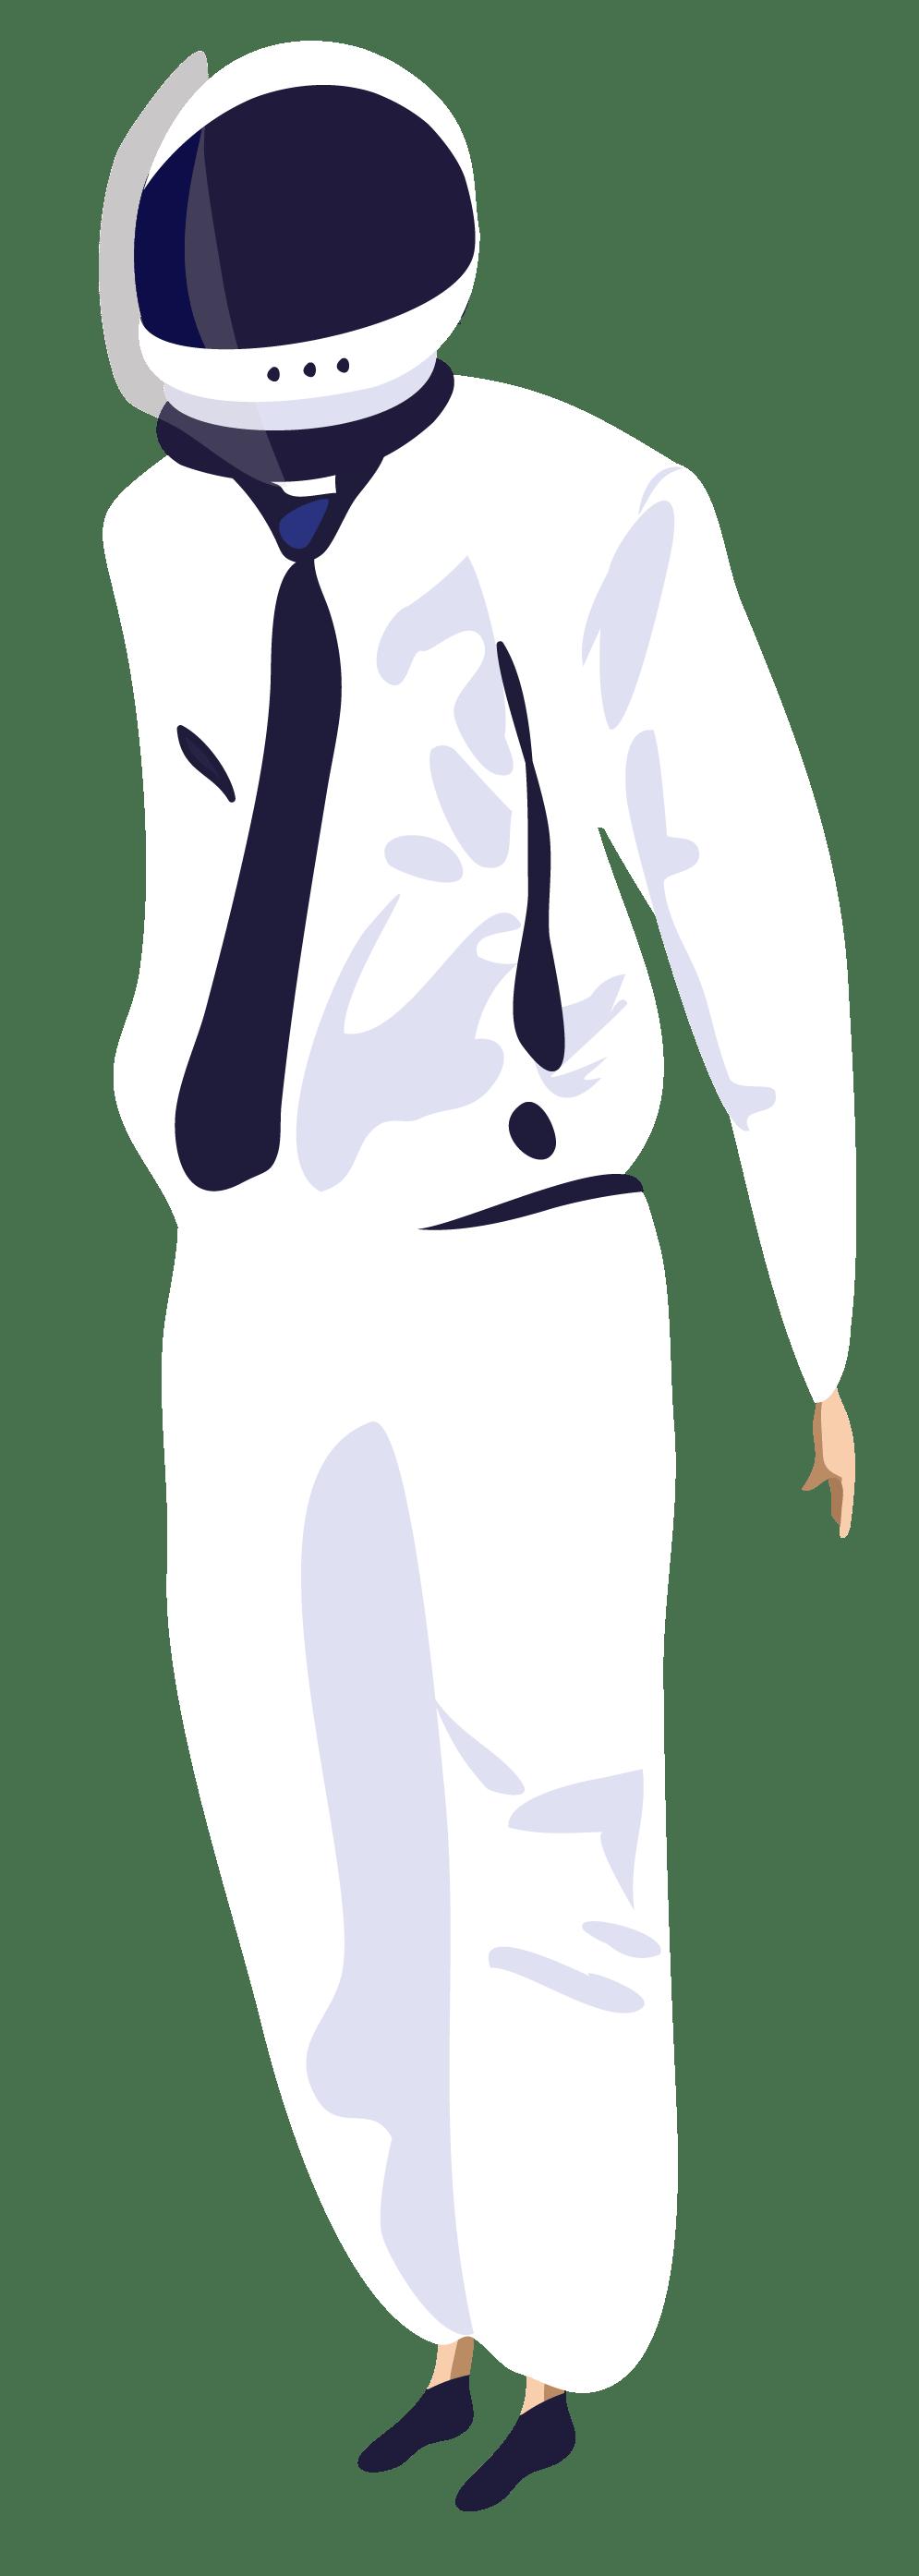 Agence Cassian - L'agence des cosmonautes !